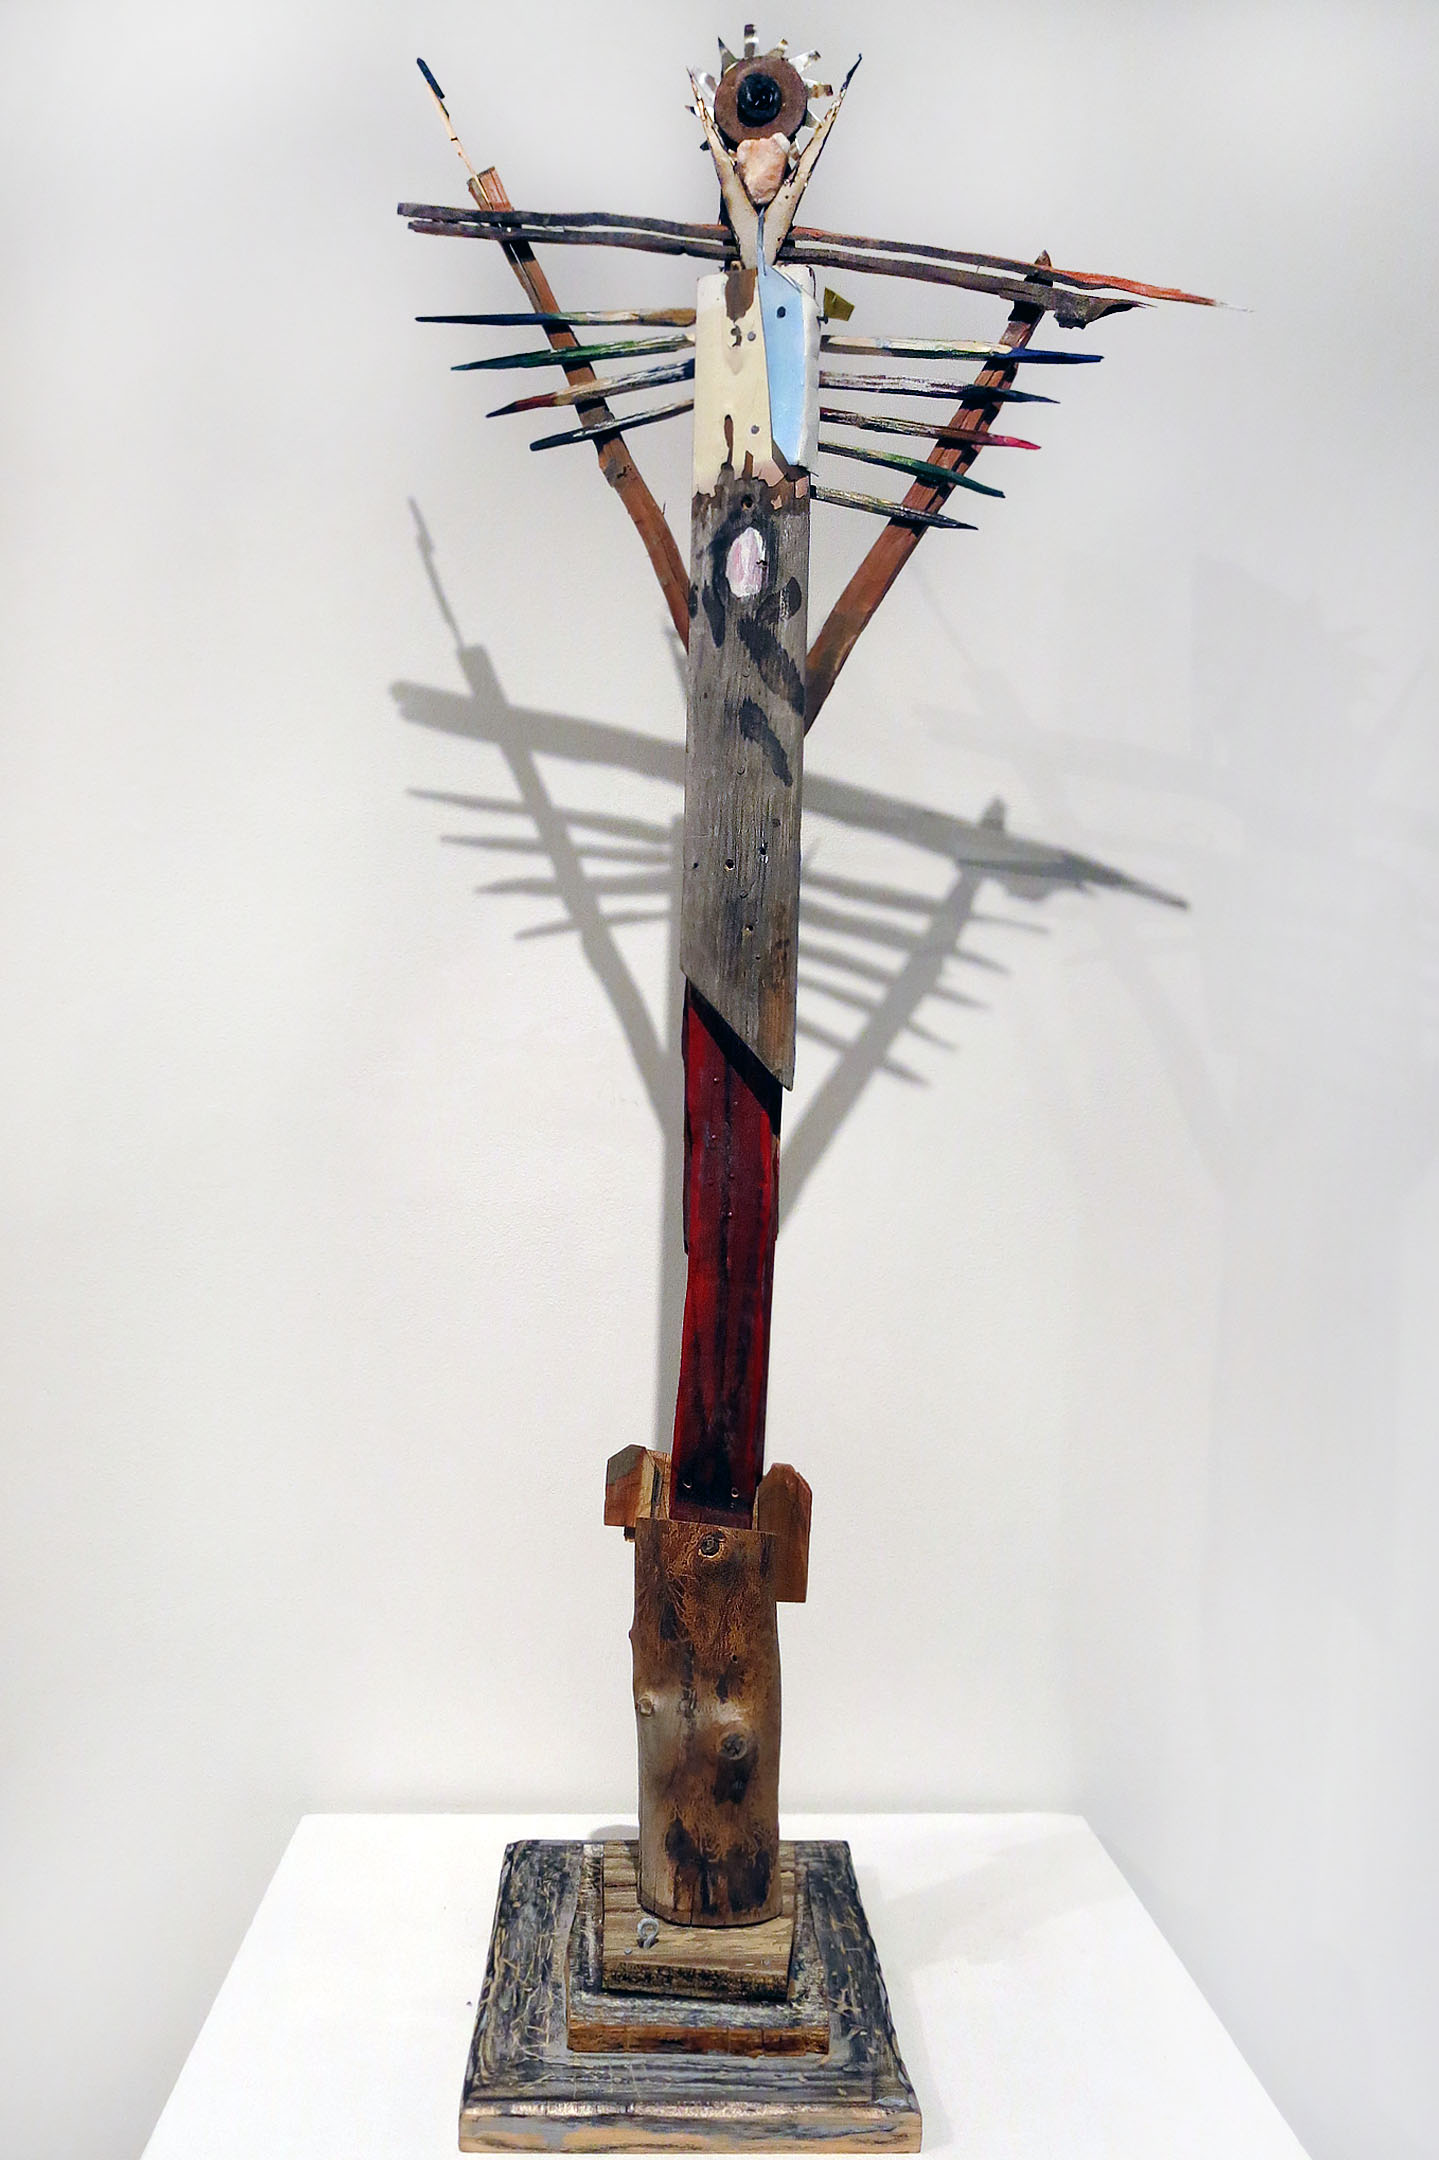 Matt Blackwell, Diety (Santos Figure), 2015, wood, metal, oil paint, ink, 36.25h x 7.125w x 11d in.